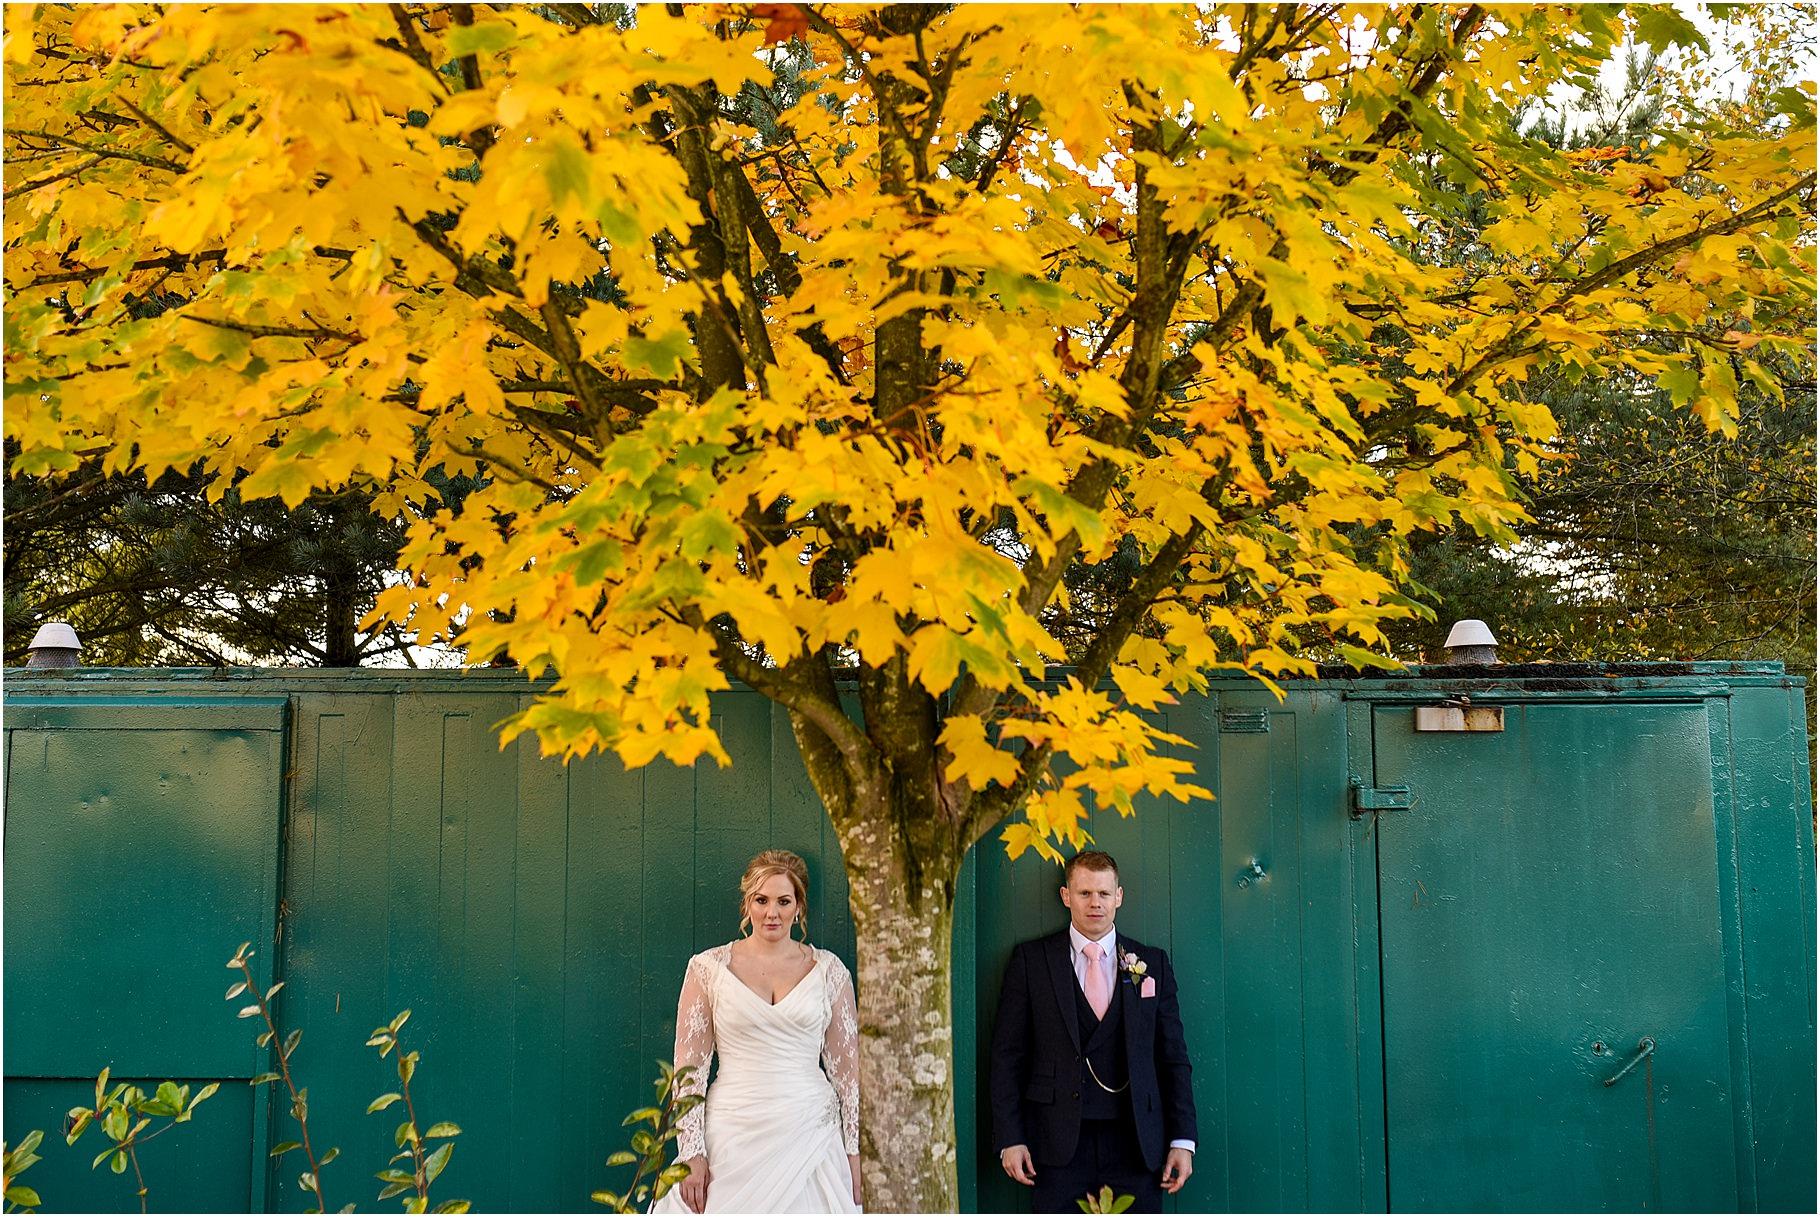 dan-wootton-photography-2017-weddings-164.jpg